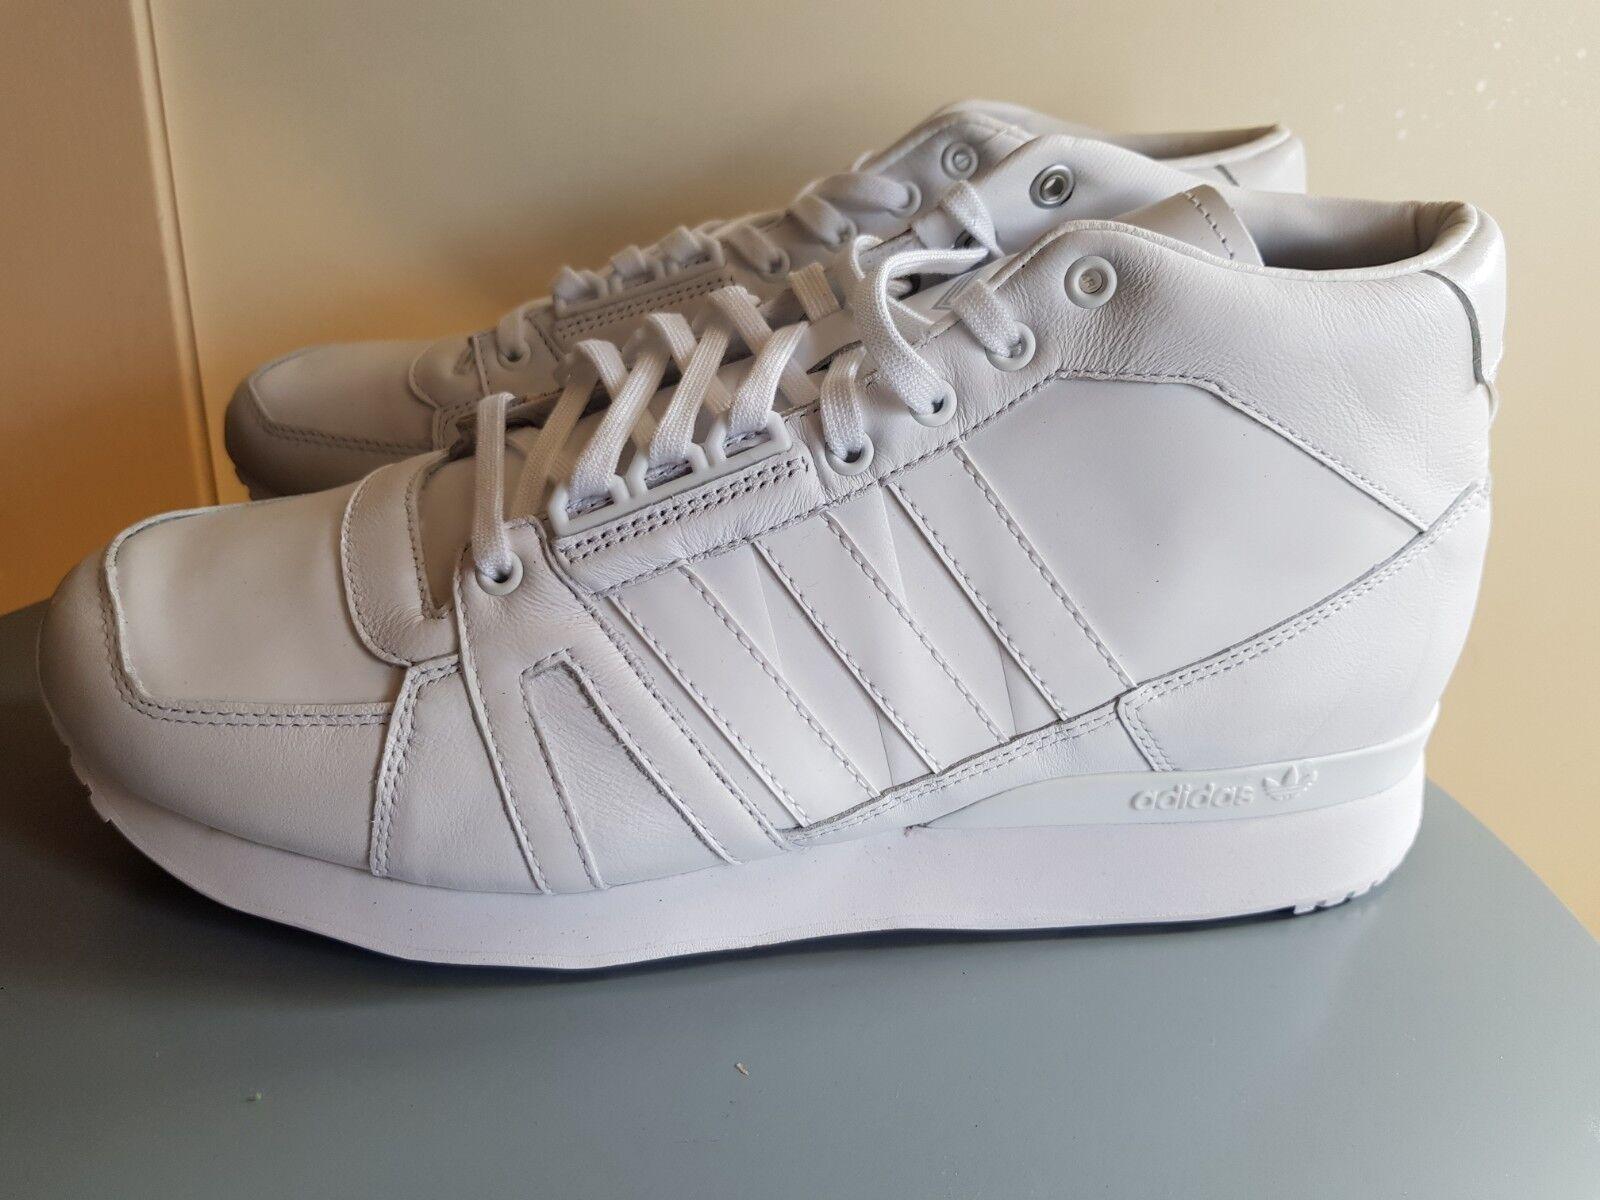 huge selection of bdab5 9adab Adidas originali originali originali zx 500 alpinismo nuovi s79450 bianco  f43fd9